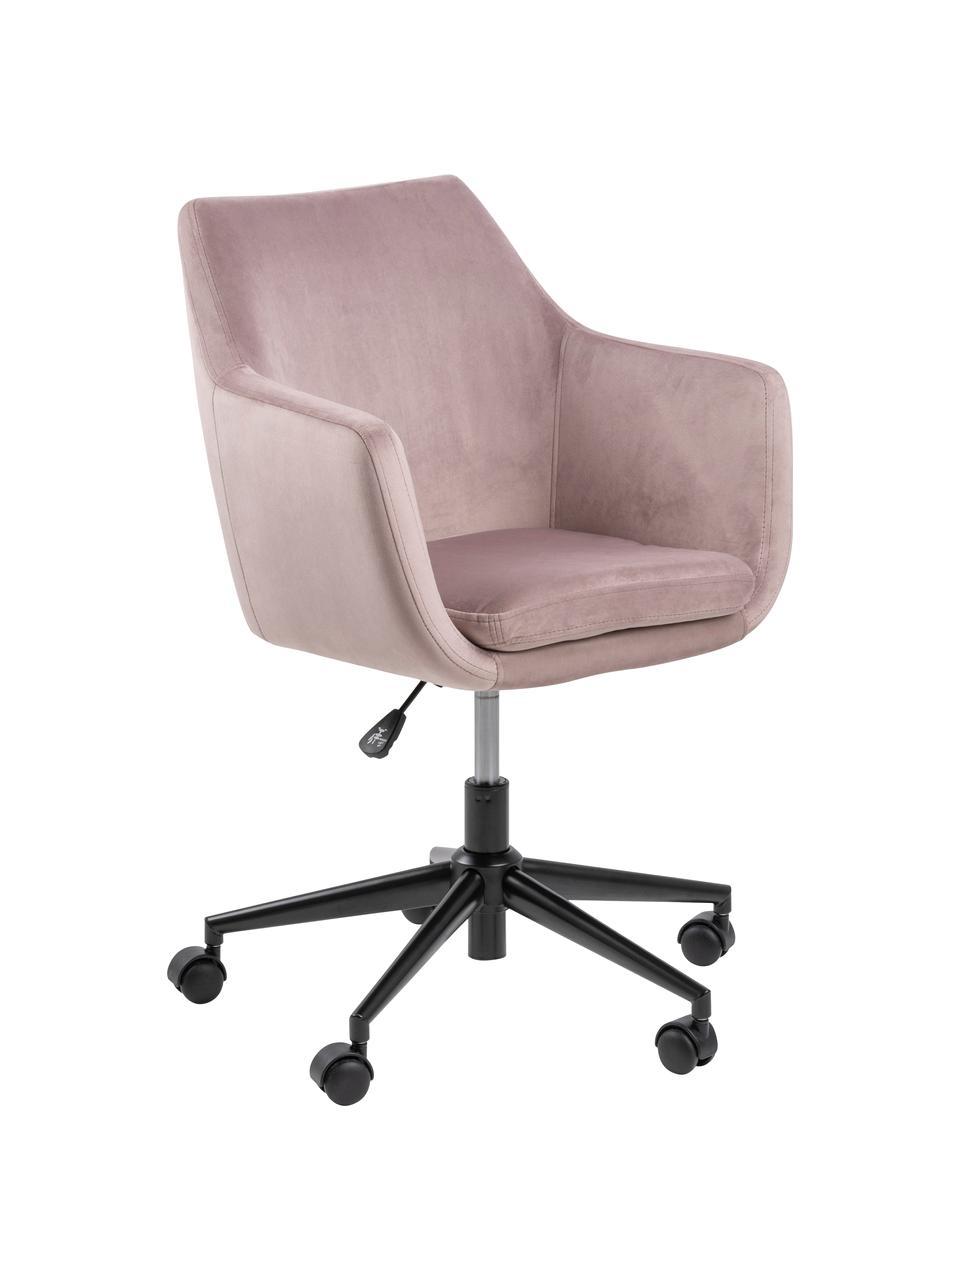 Samt-Bürodrehstuhl Nora, höhenverstellbar, Bezug: Polyester (Samt) 25.000 S, Gestell: Metall, pulverbeschichtet, Samt Rosa, B 58 x T 58 cm